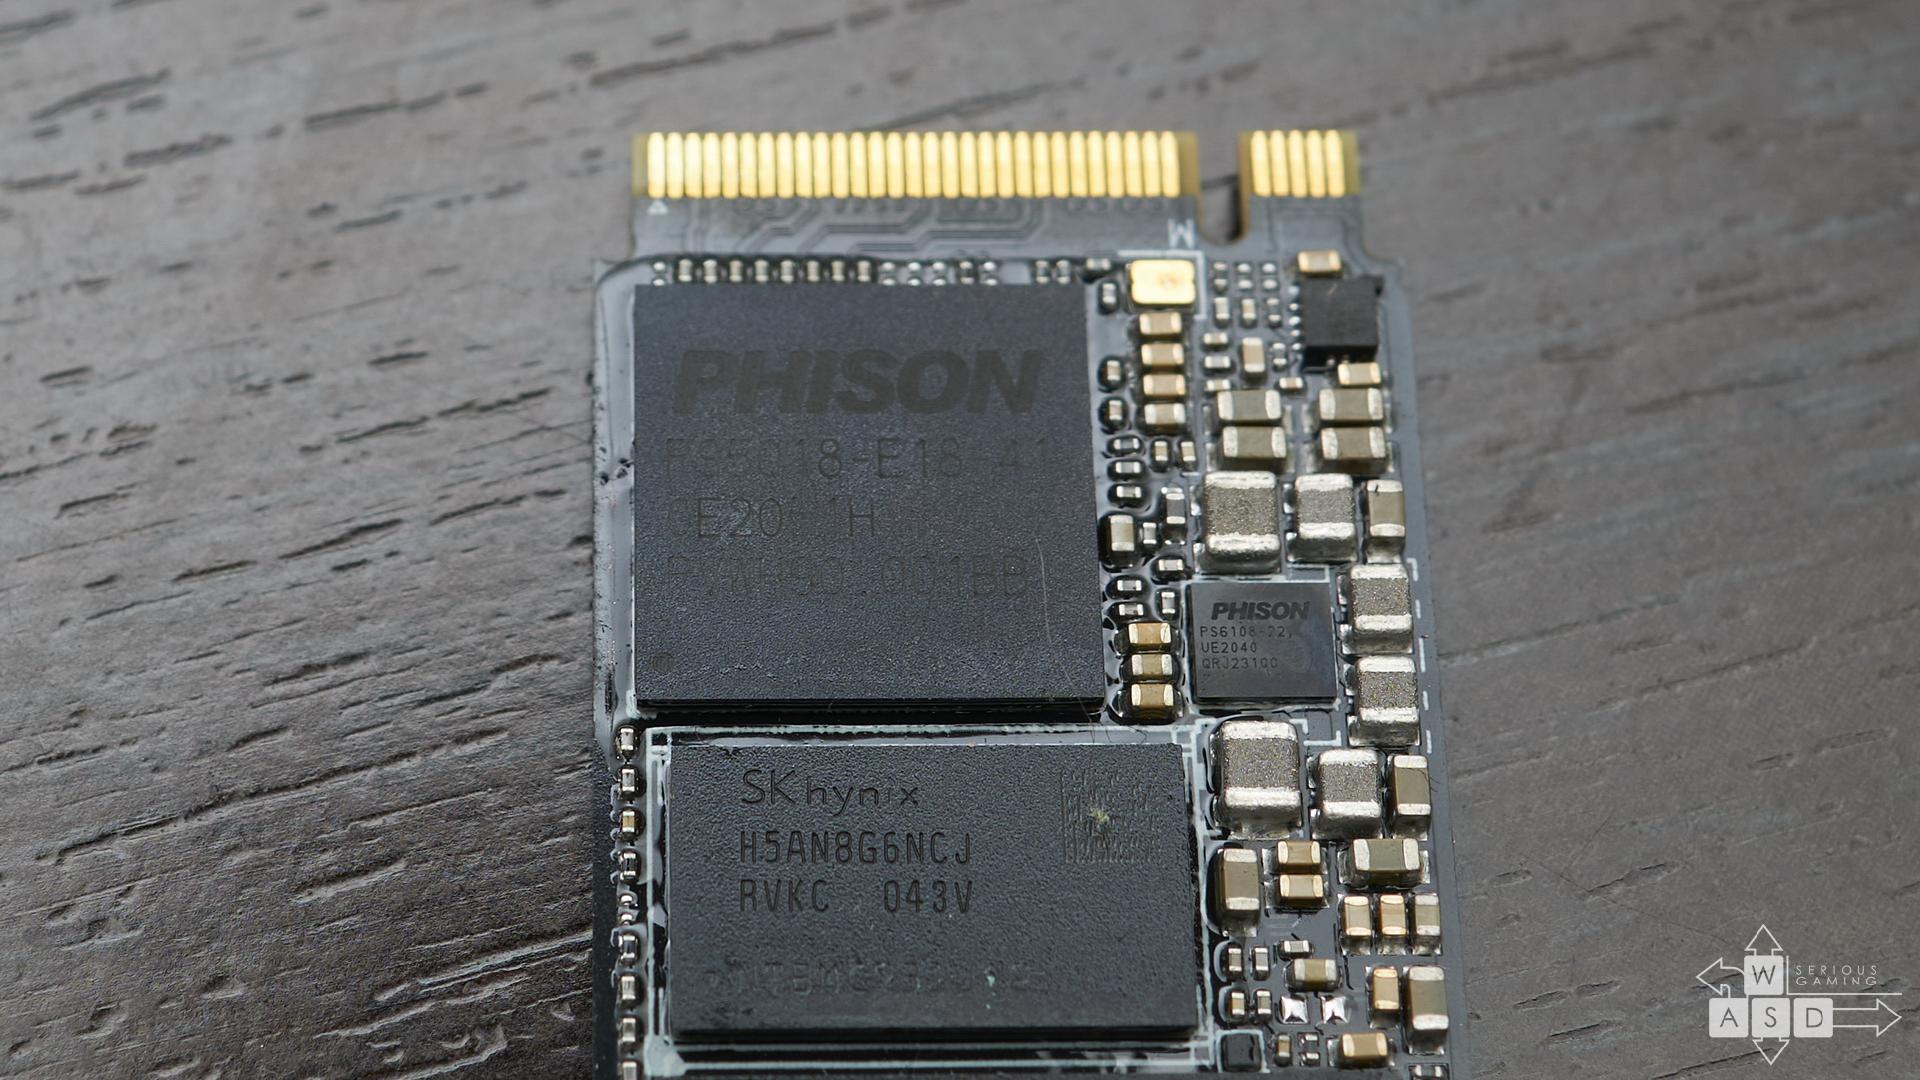 CORSAIR MP600 PRO HYDRO X 2TB review   WASD